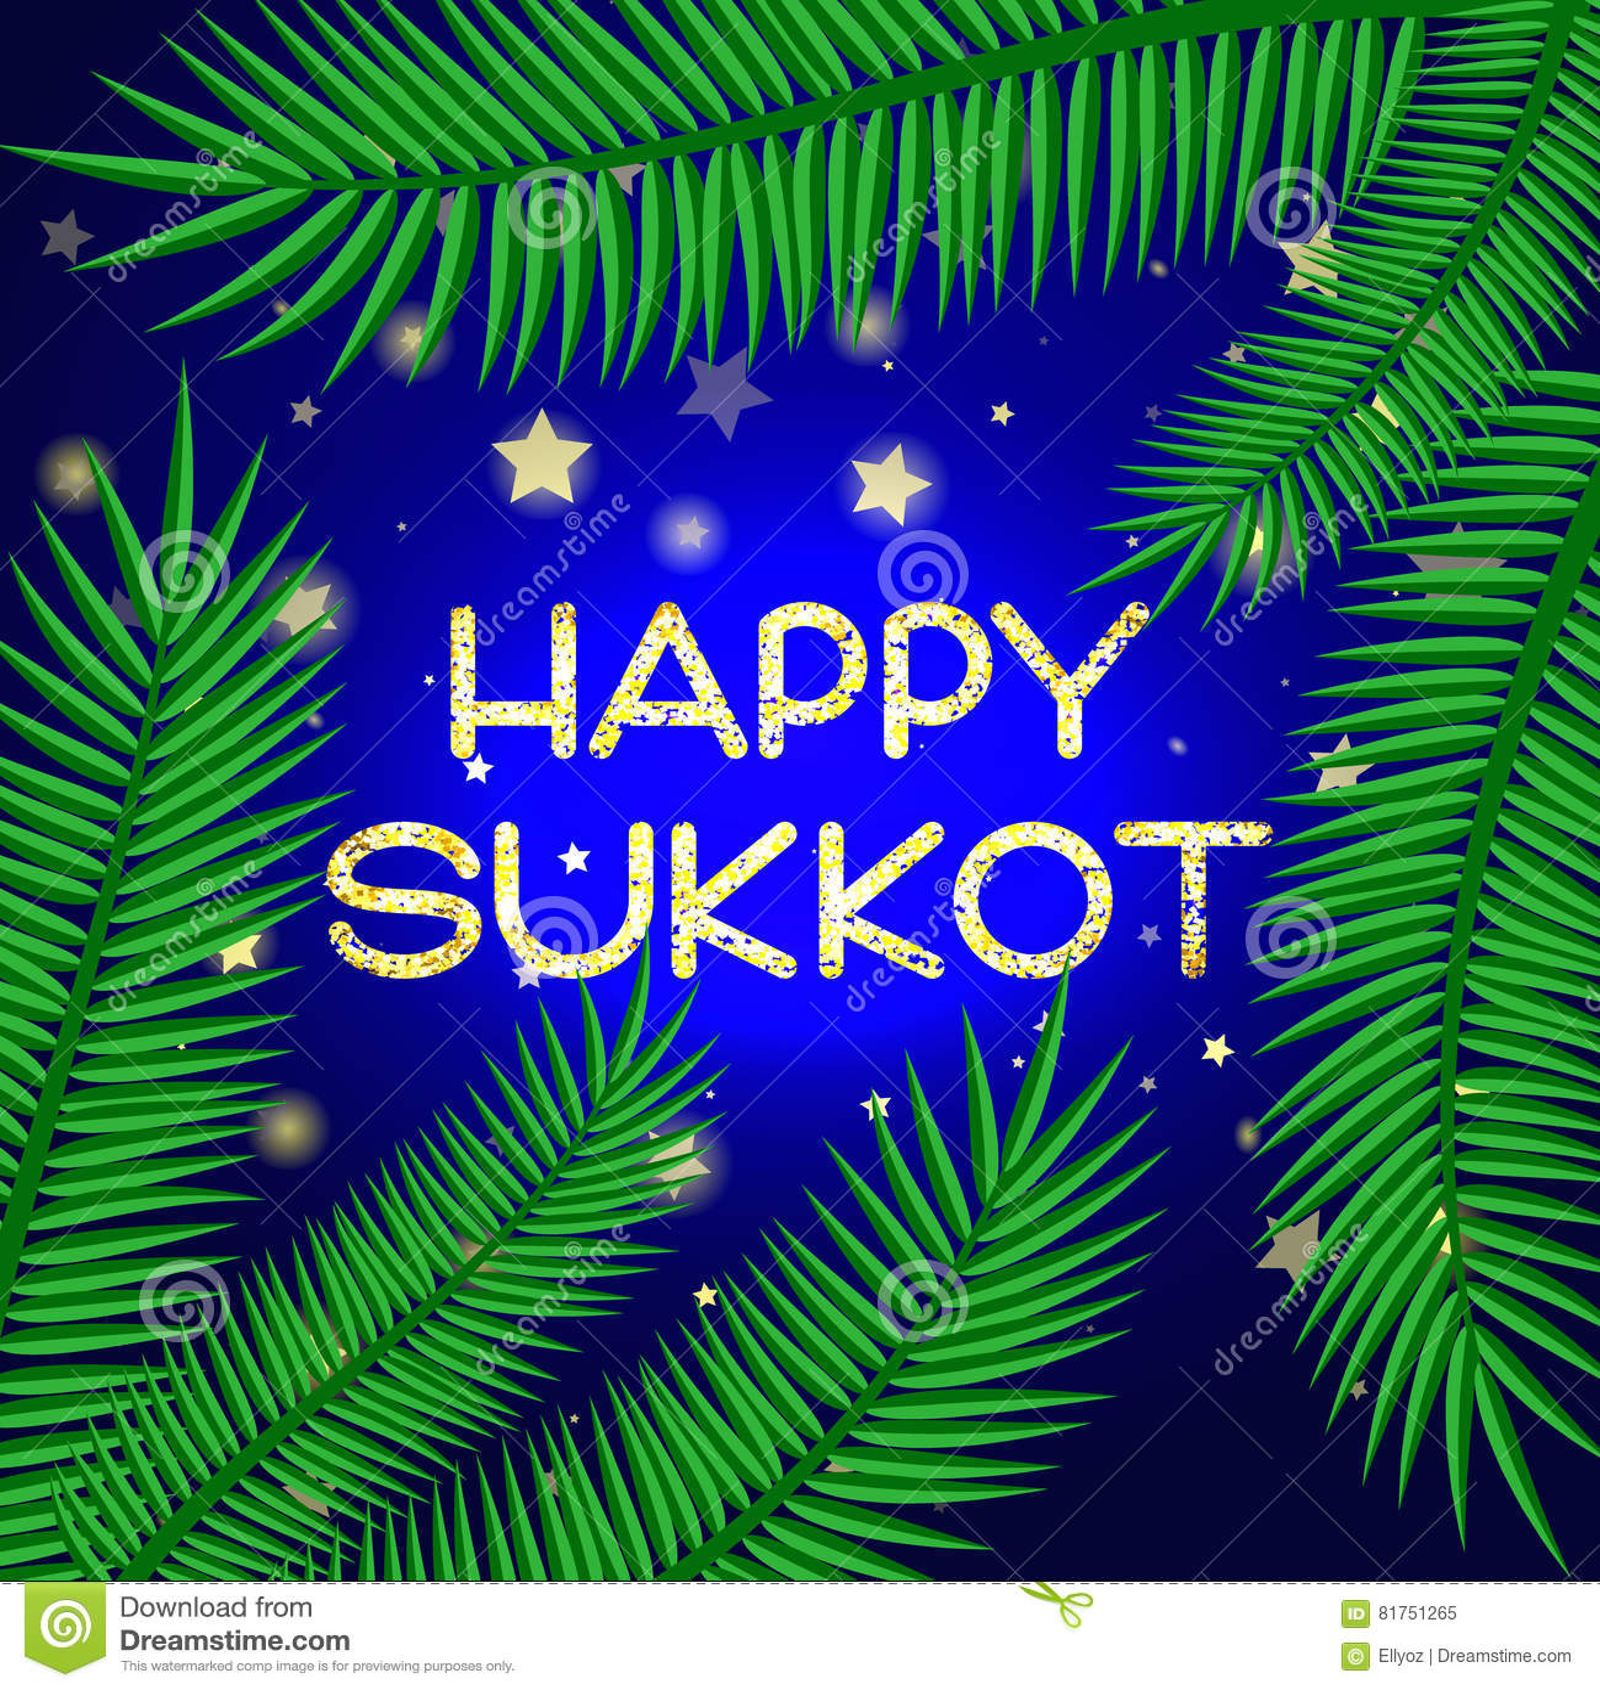 Sukkot festival greeting card stock vector illustration of sukkot festival greeting card m4hsunfo